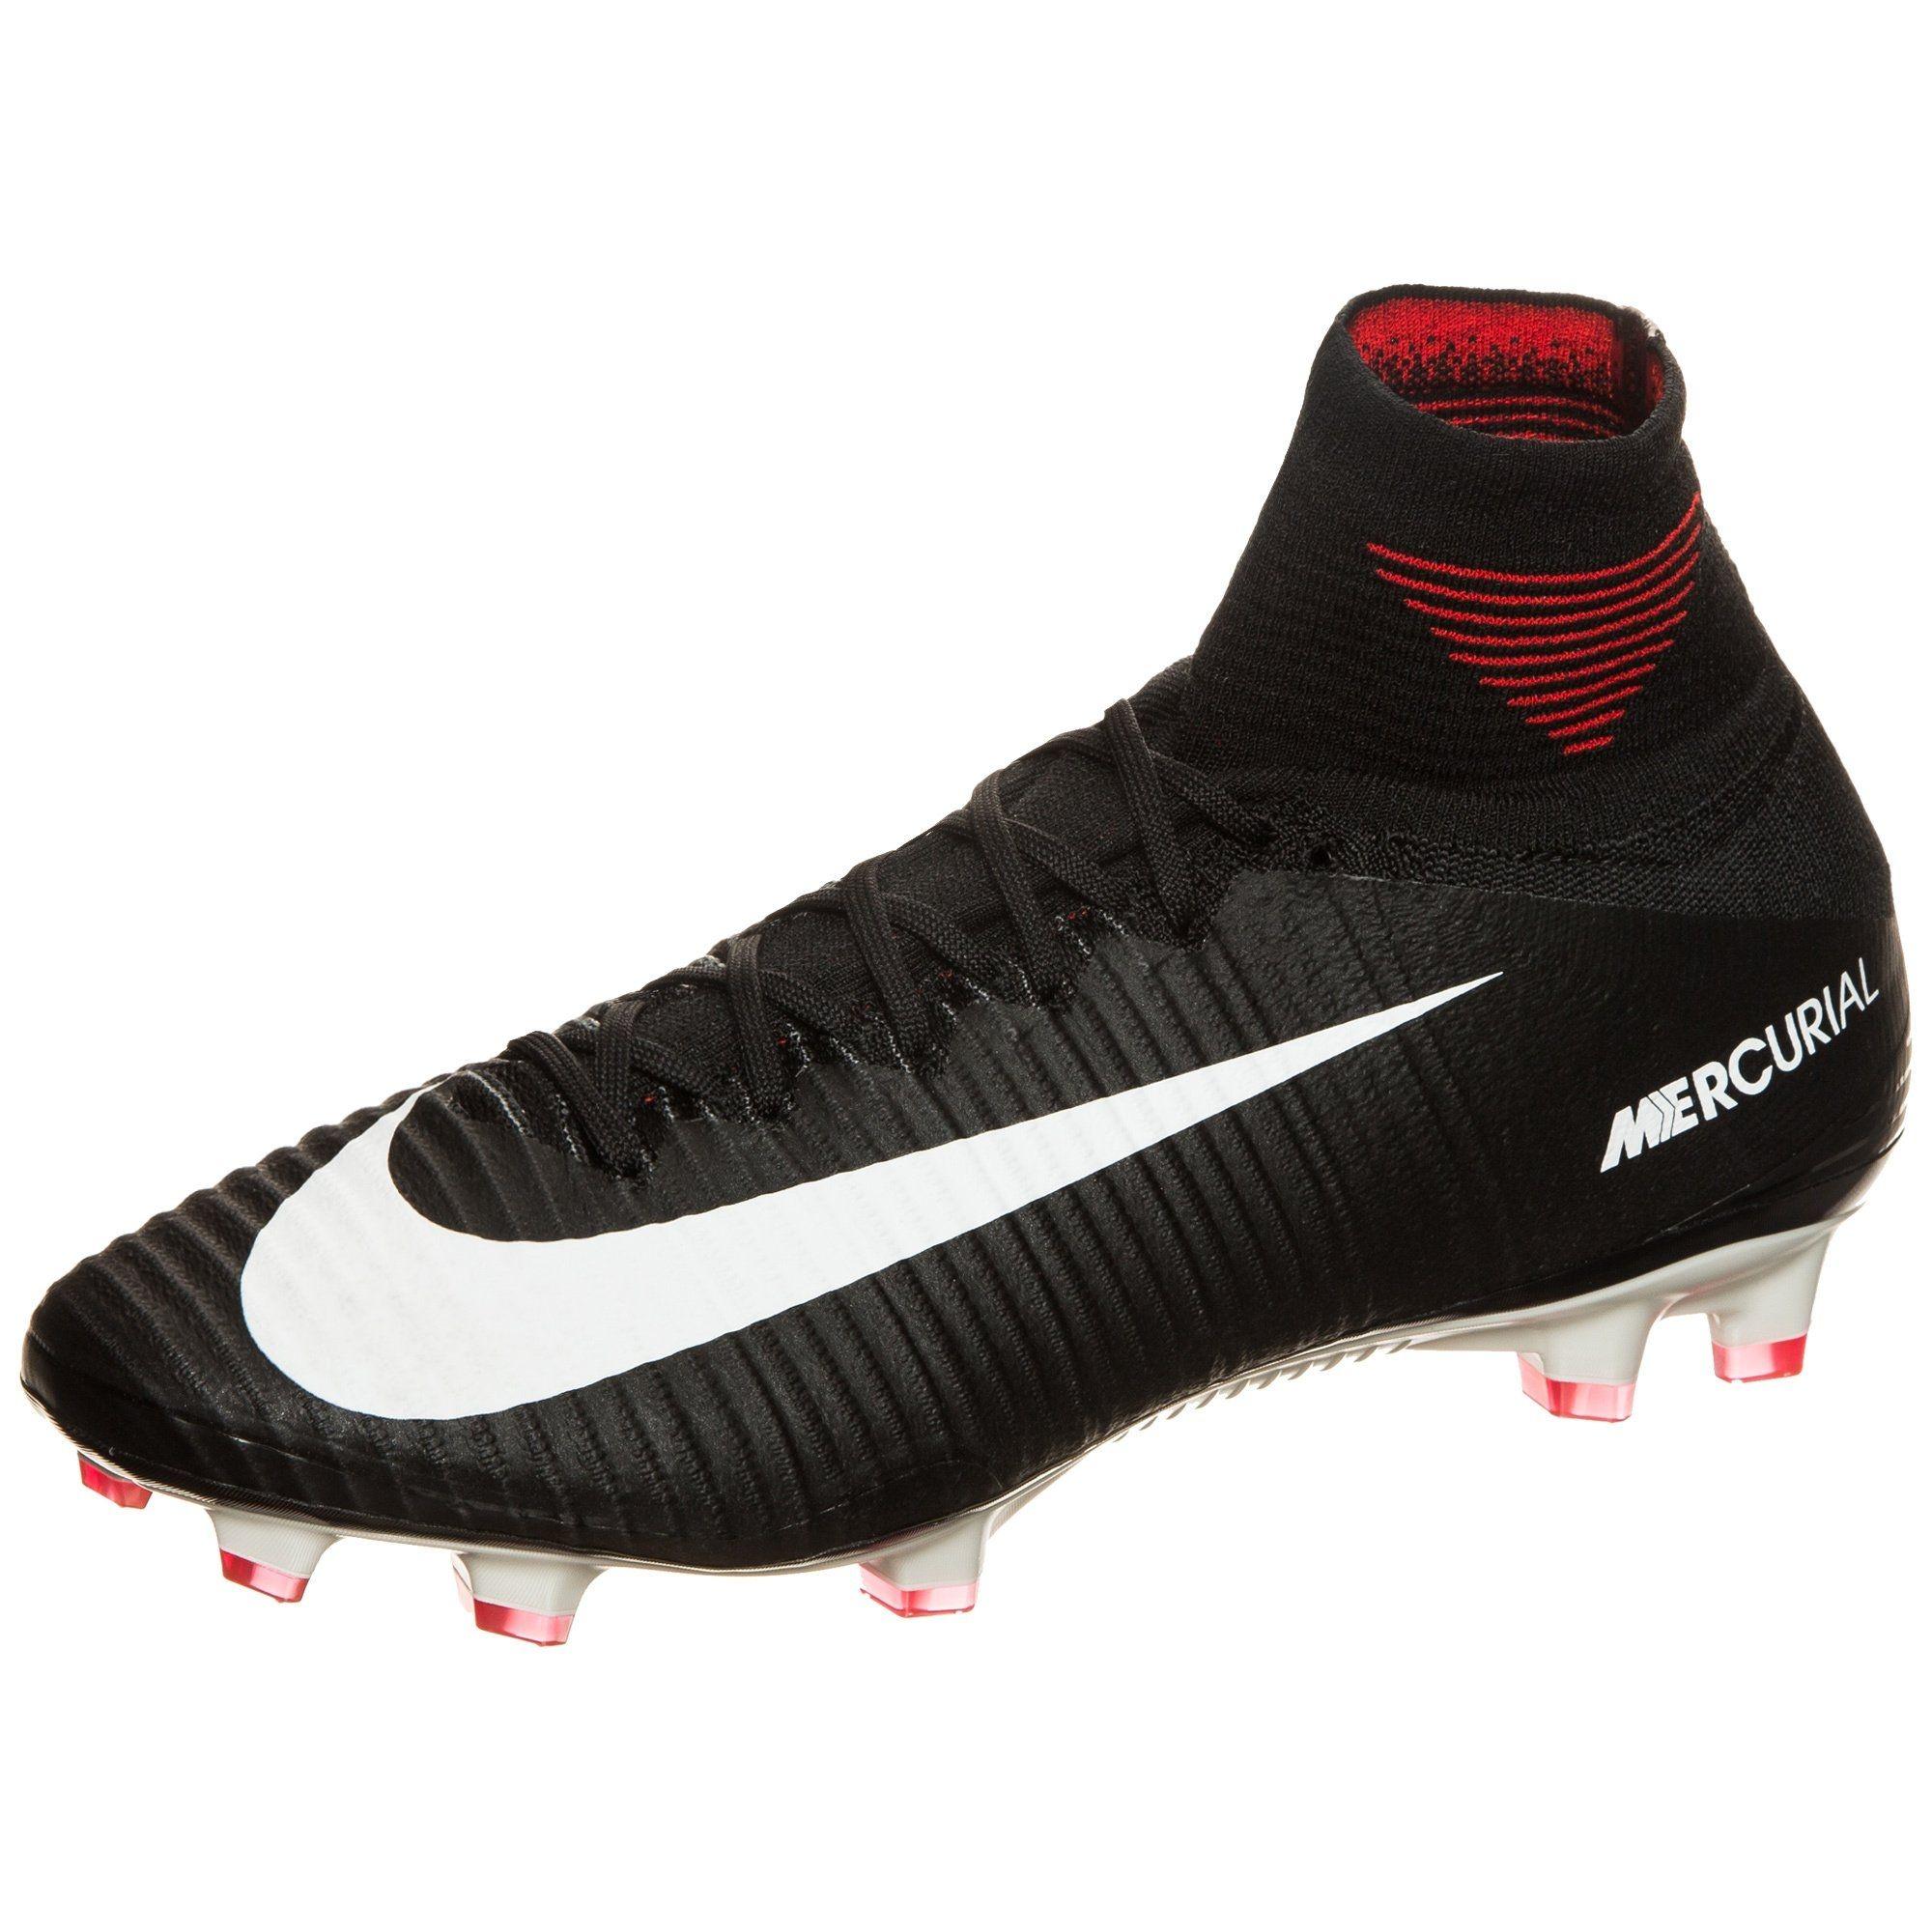 voetbalschoenen »Mercurial Superfly V« | F o o t b a l l